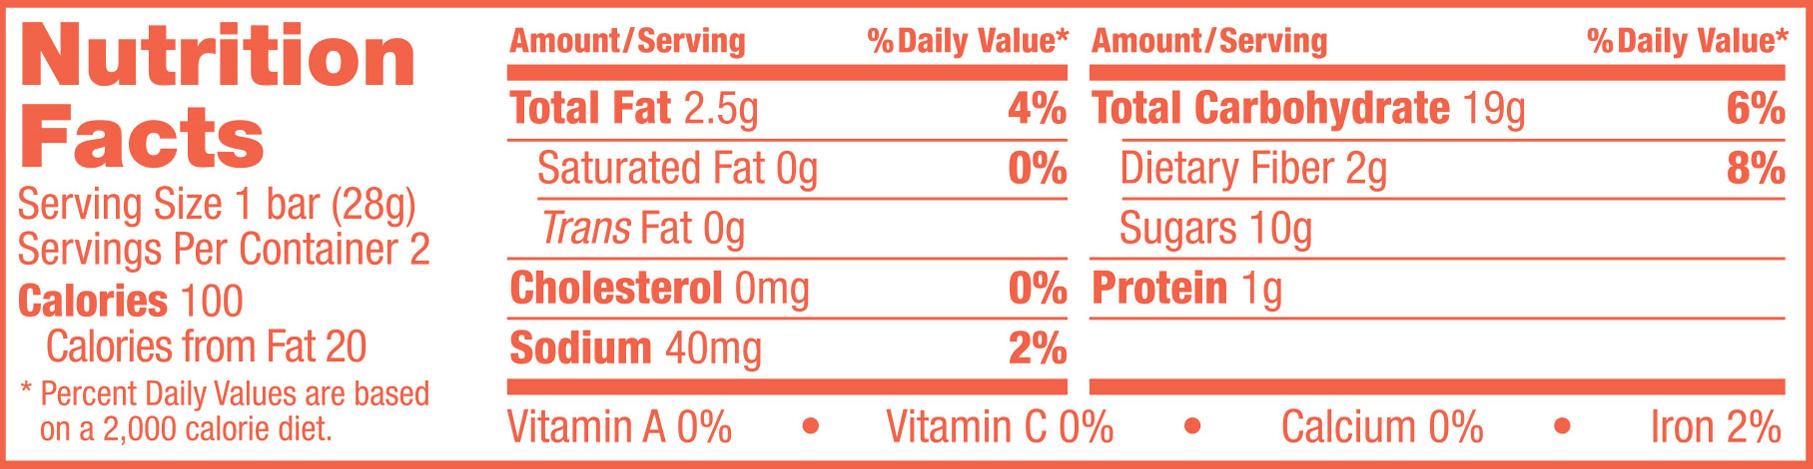 Whole Wheat Peach Apricot Nutrition Panel